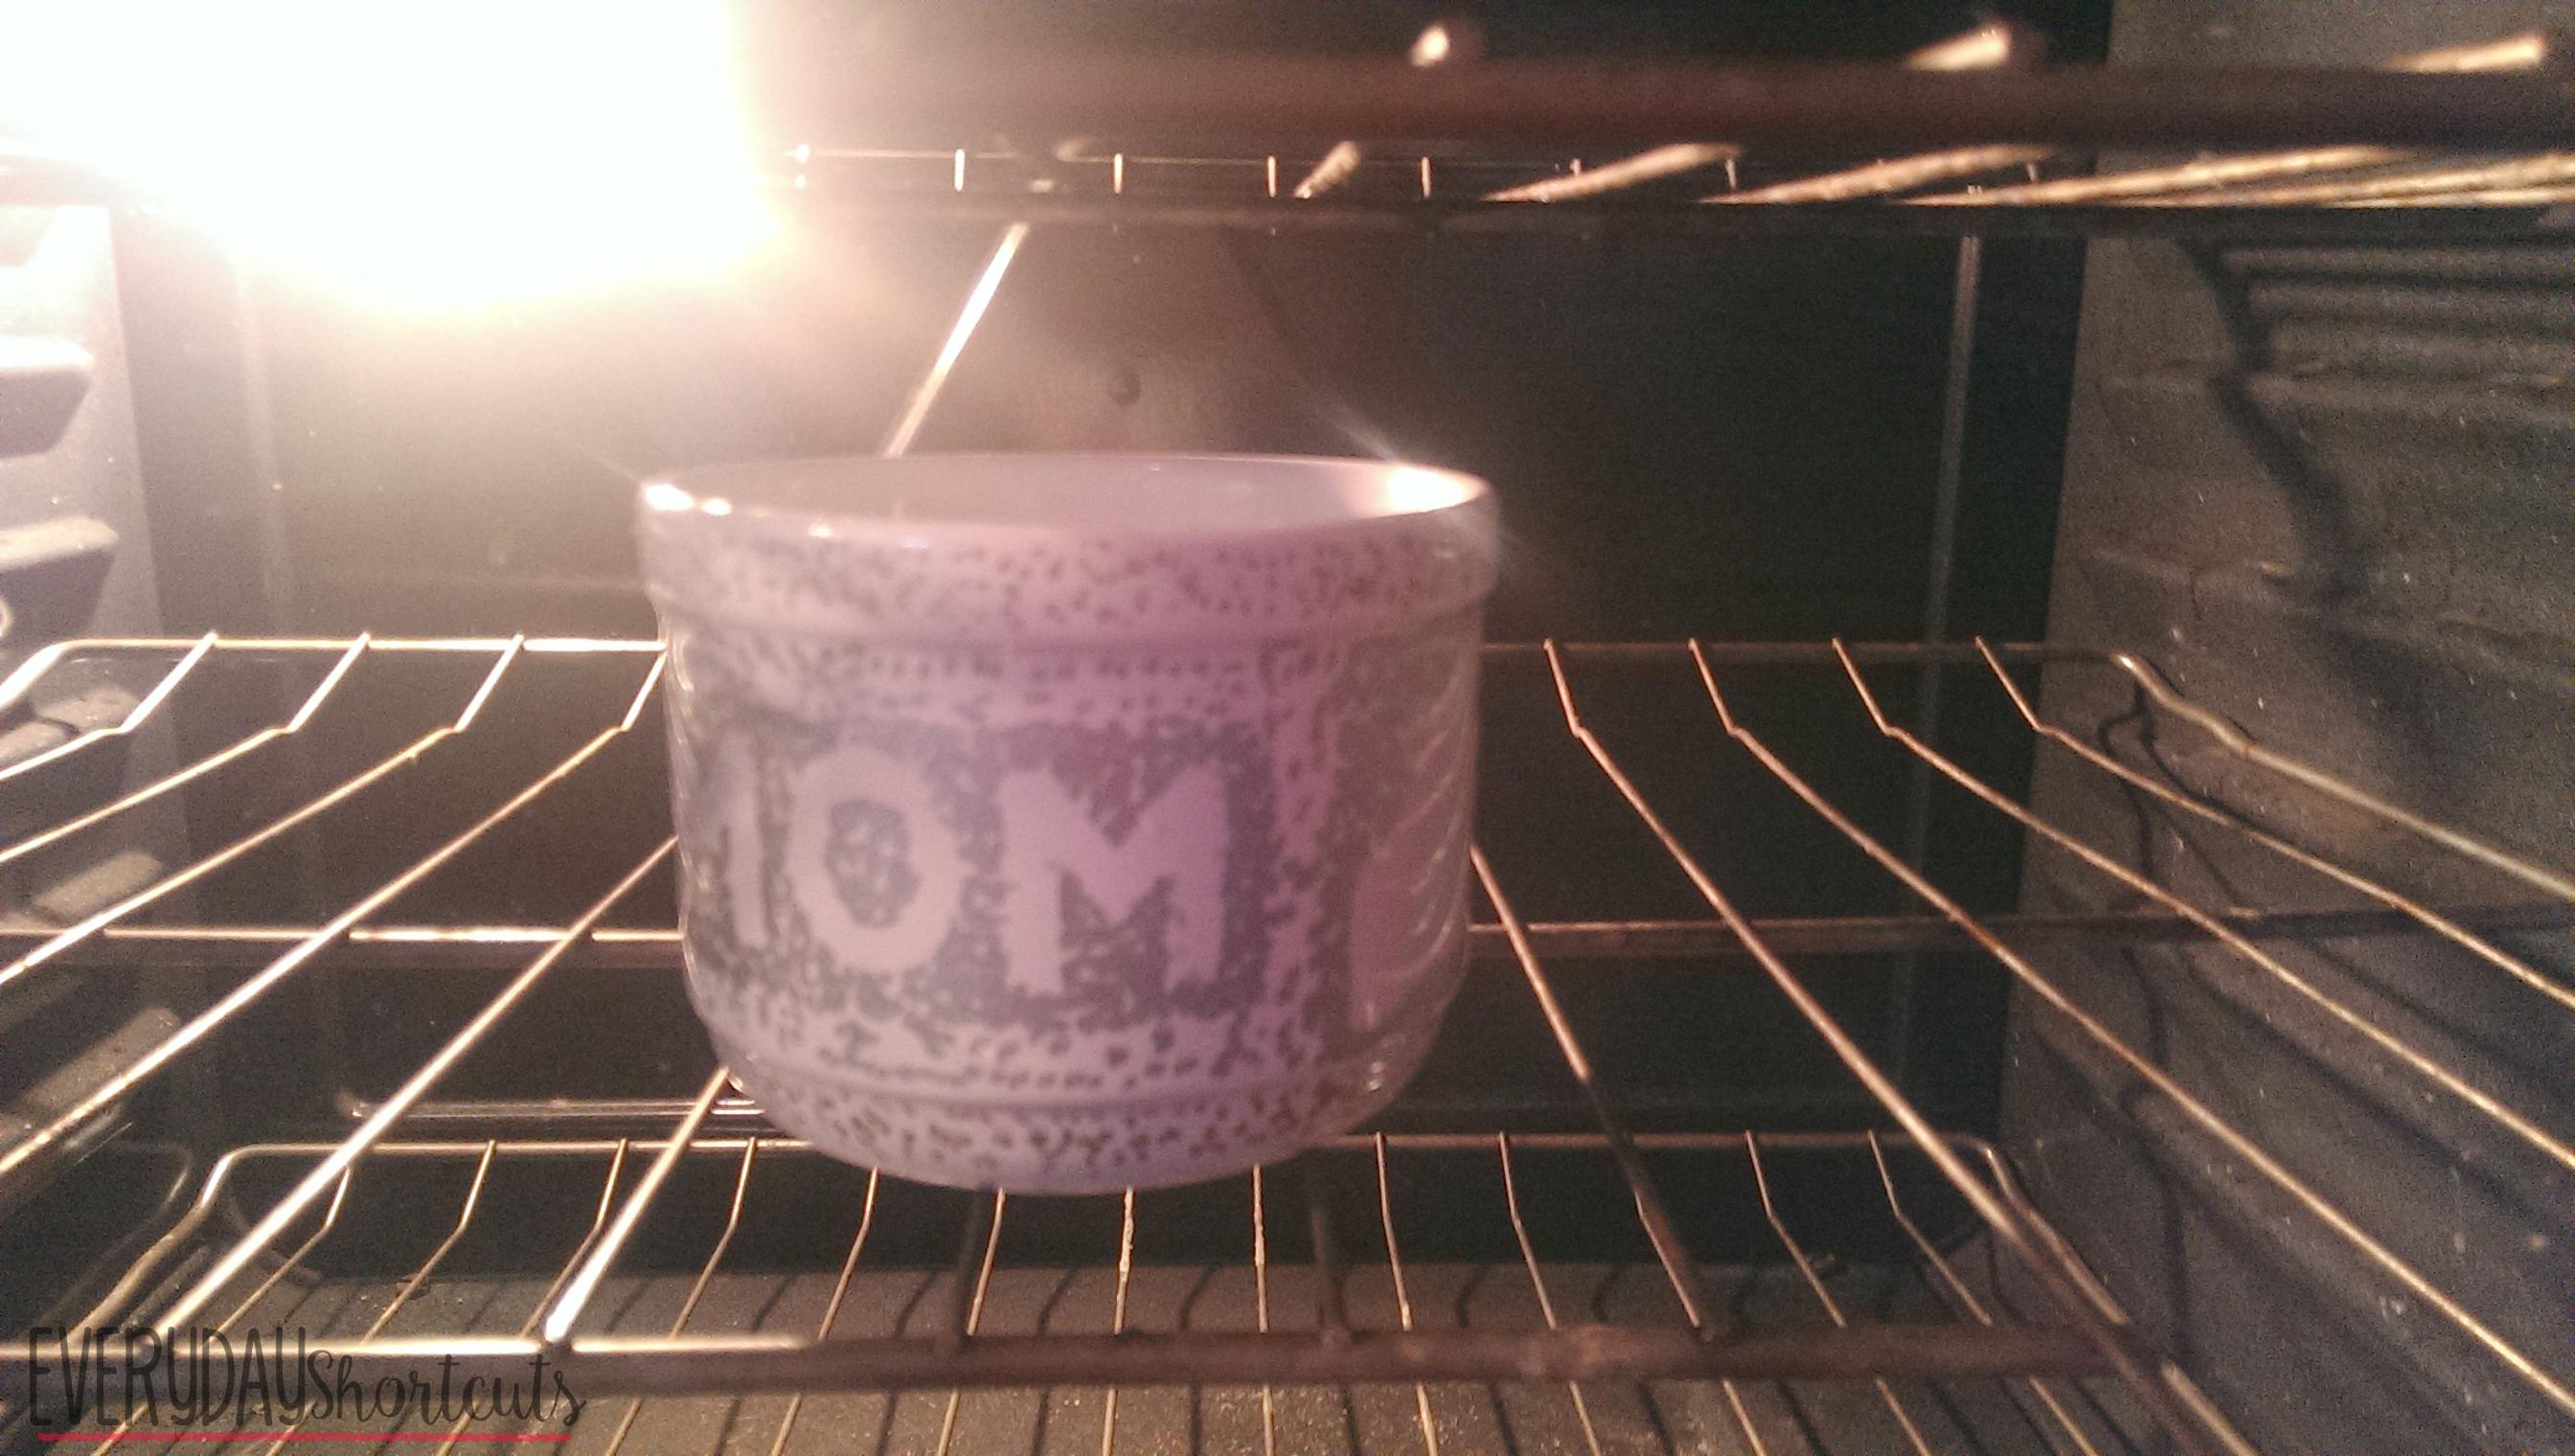 mom sharpie mug in the oven